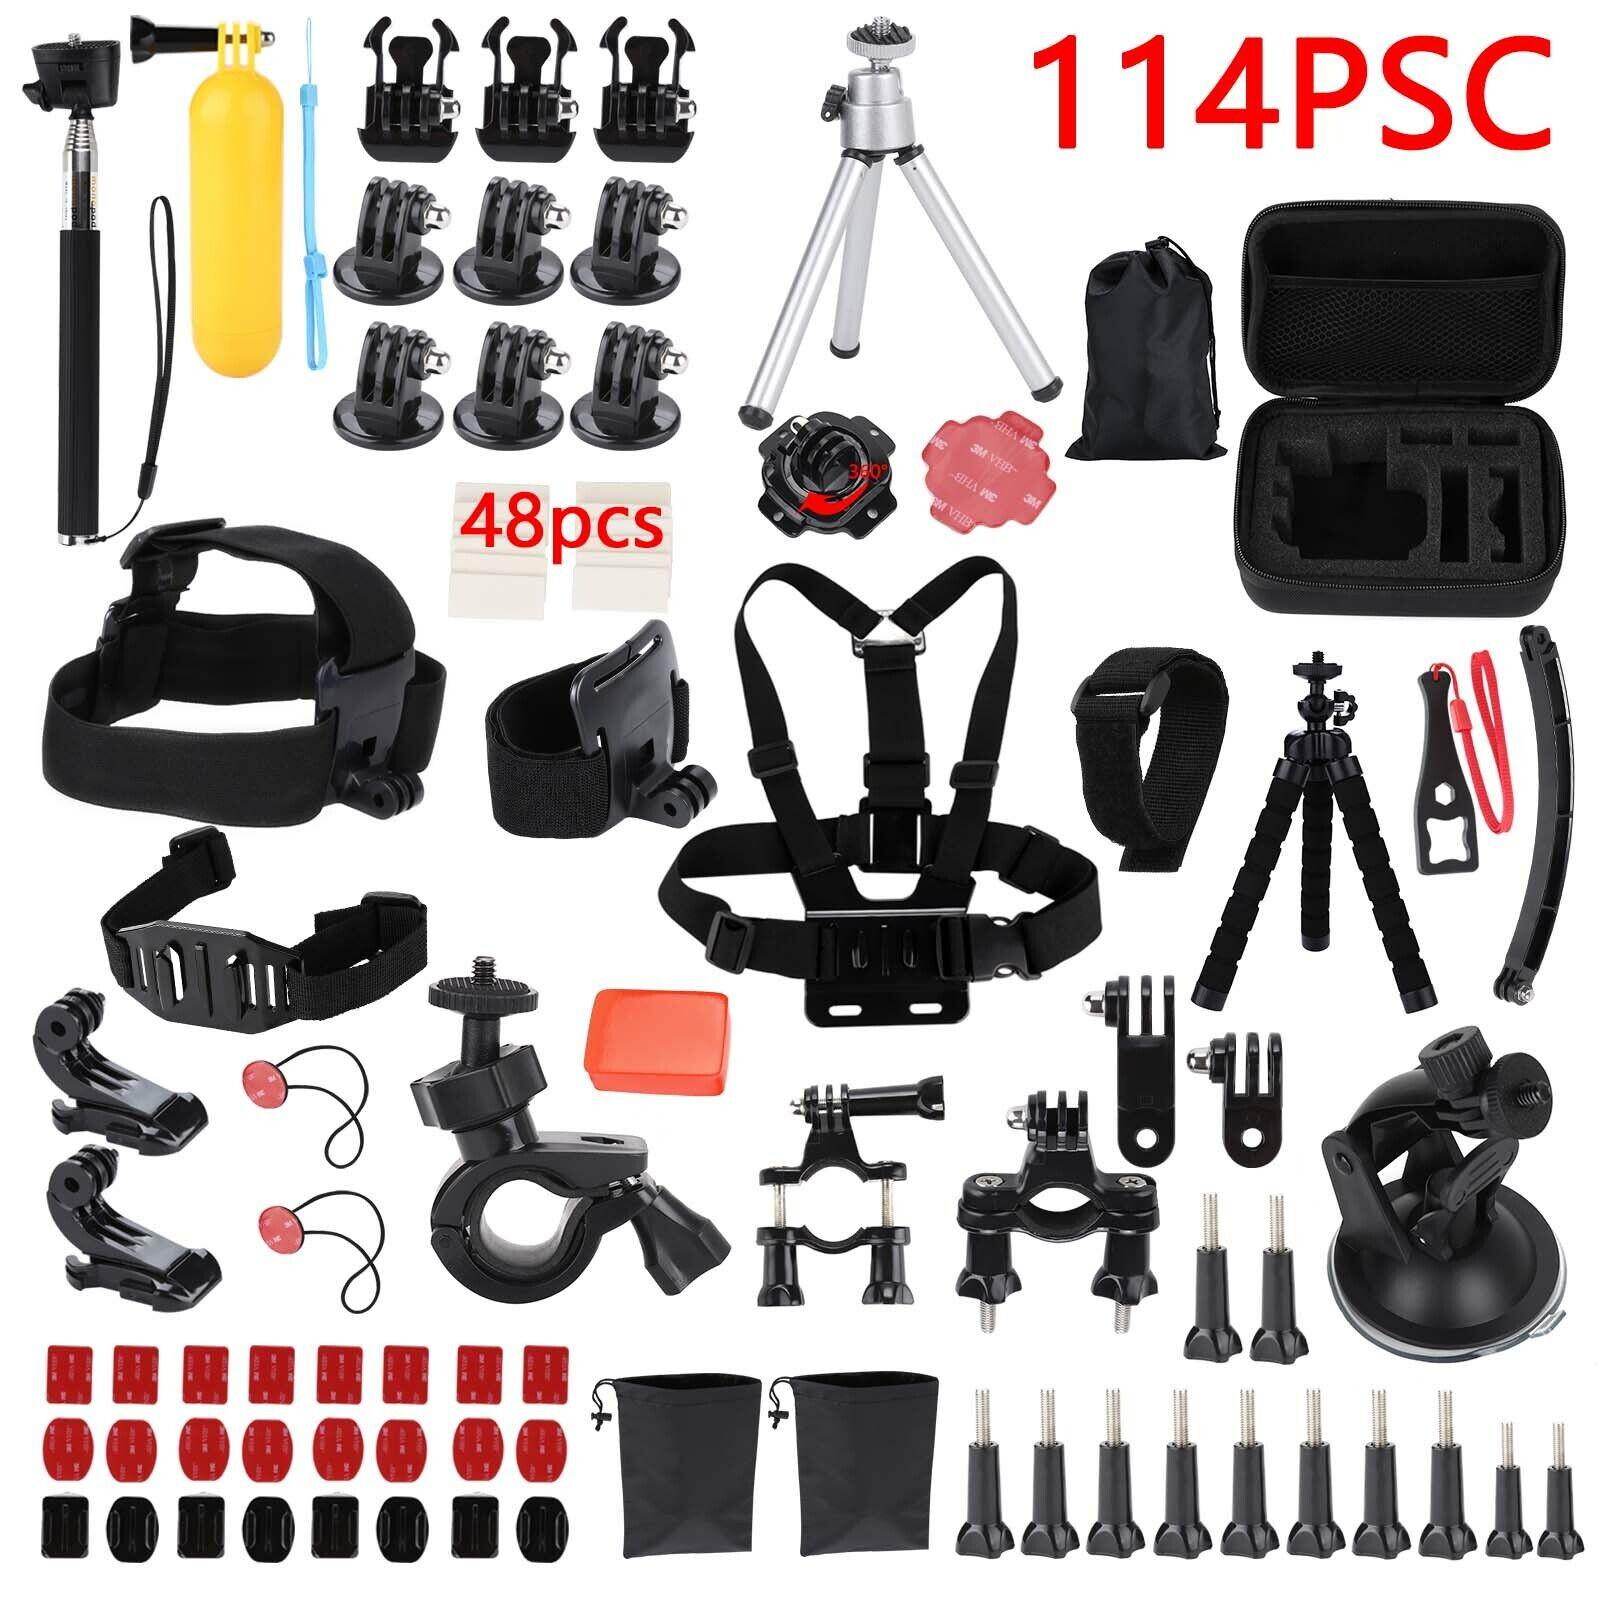 114pcs GoPro Accessories Camera Accessory Kit Bundle Chest Strap Head Mount